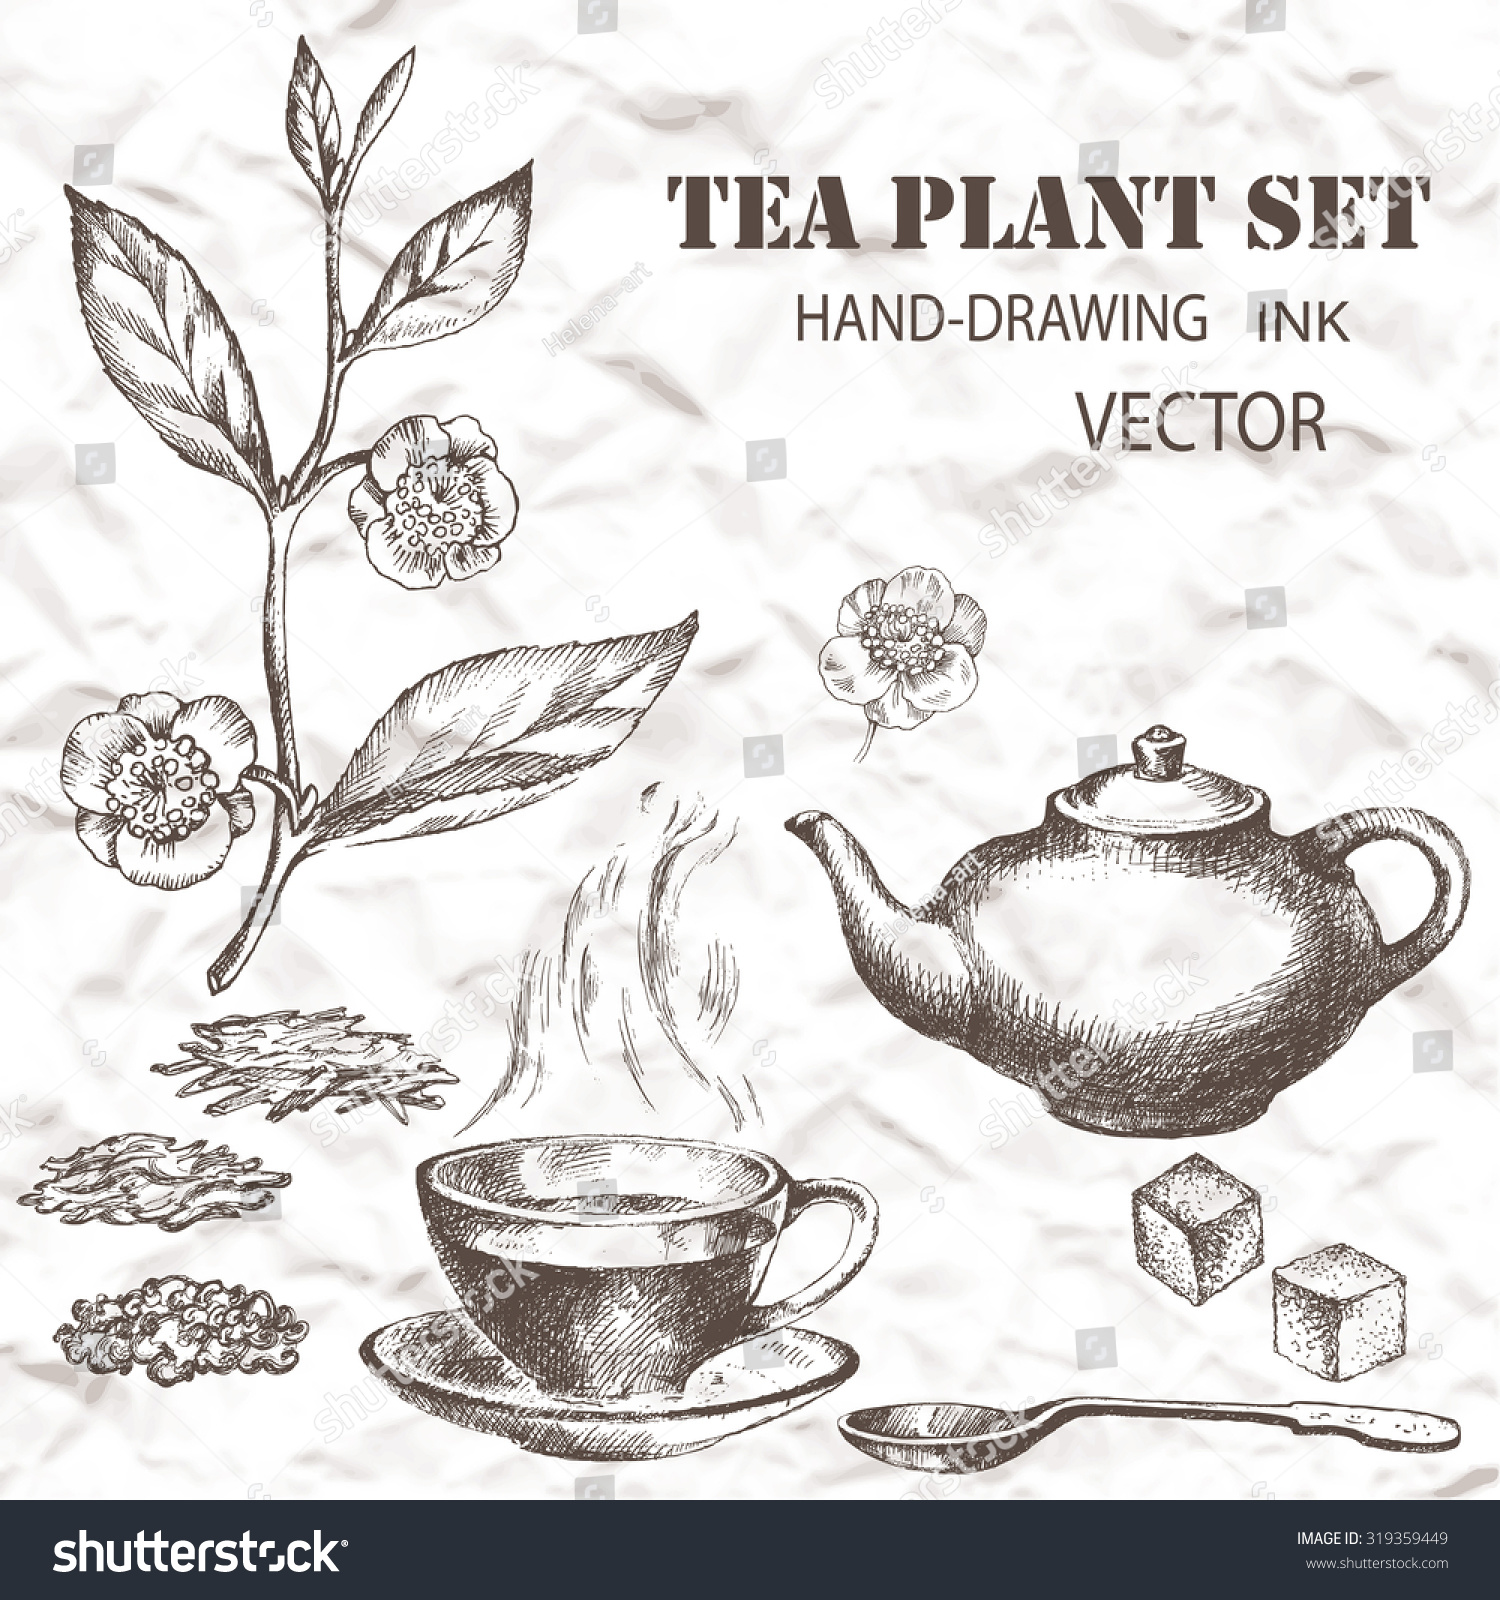 Tea Plant Set Hand Drawn Vintage Background